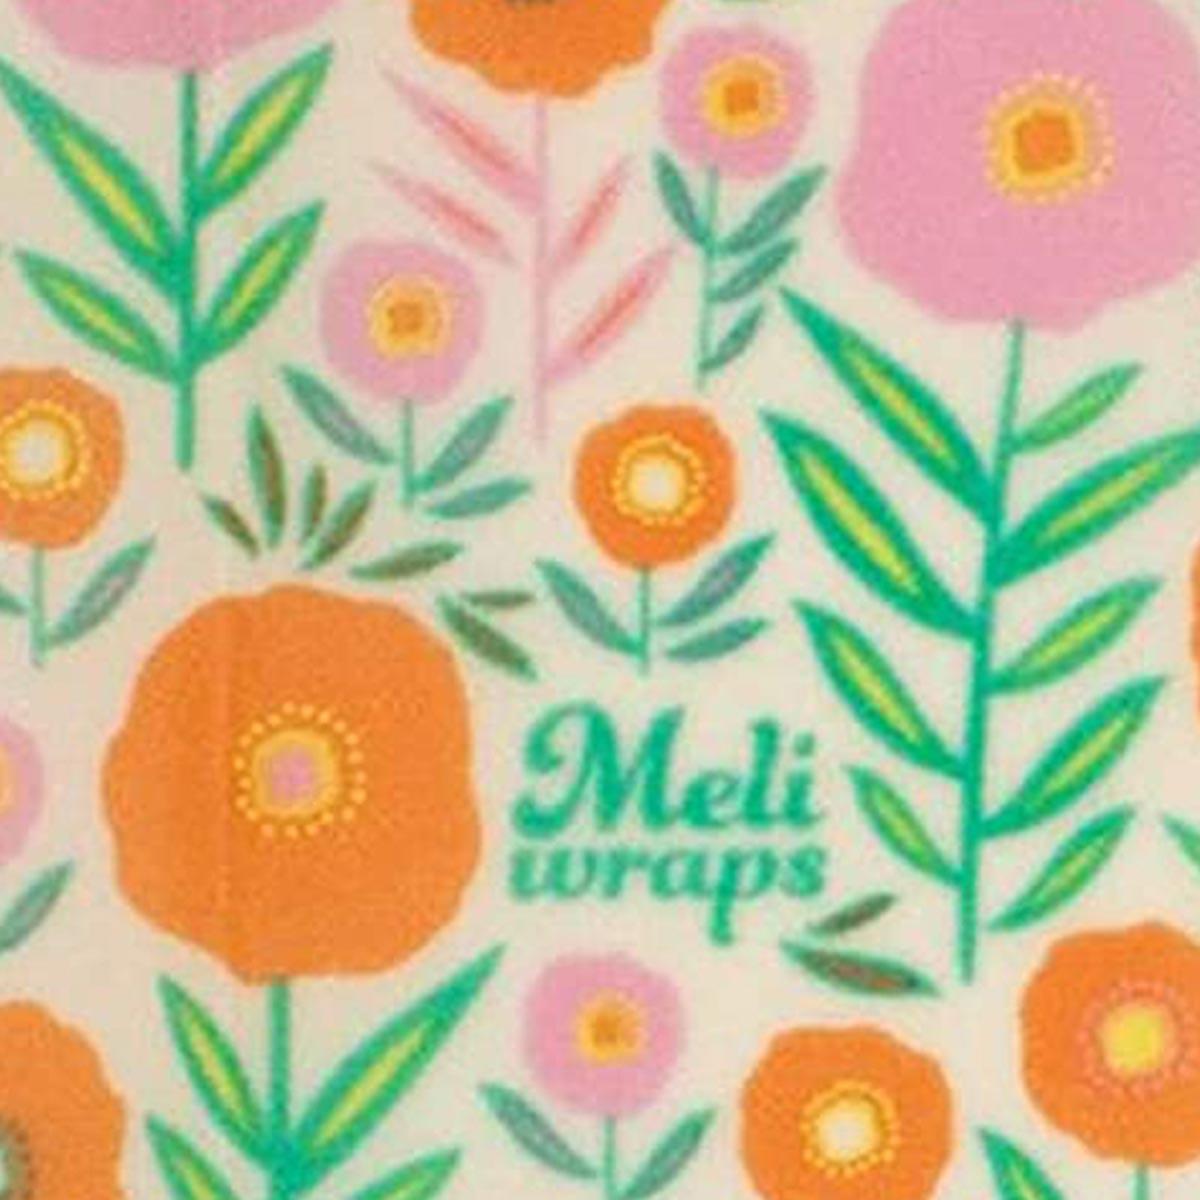 Meli Wraps 3-Pack (Sm/Med/Lrg) Reusable Beeswax Food Wrap, Bloom Print